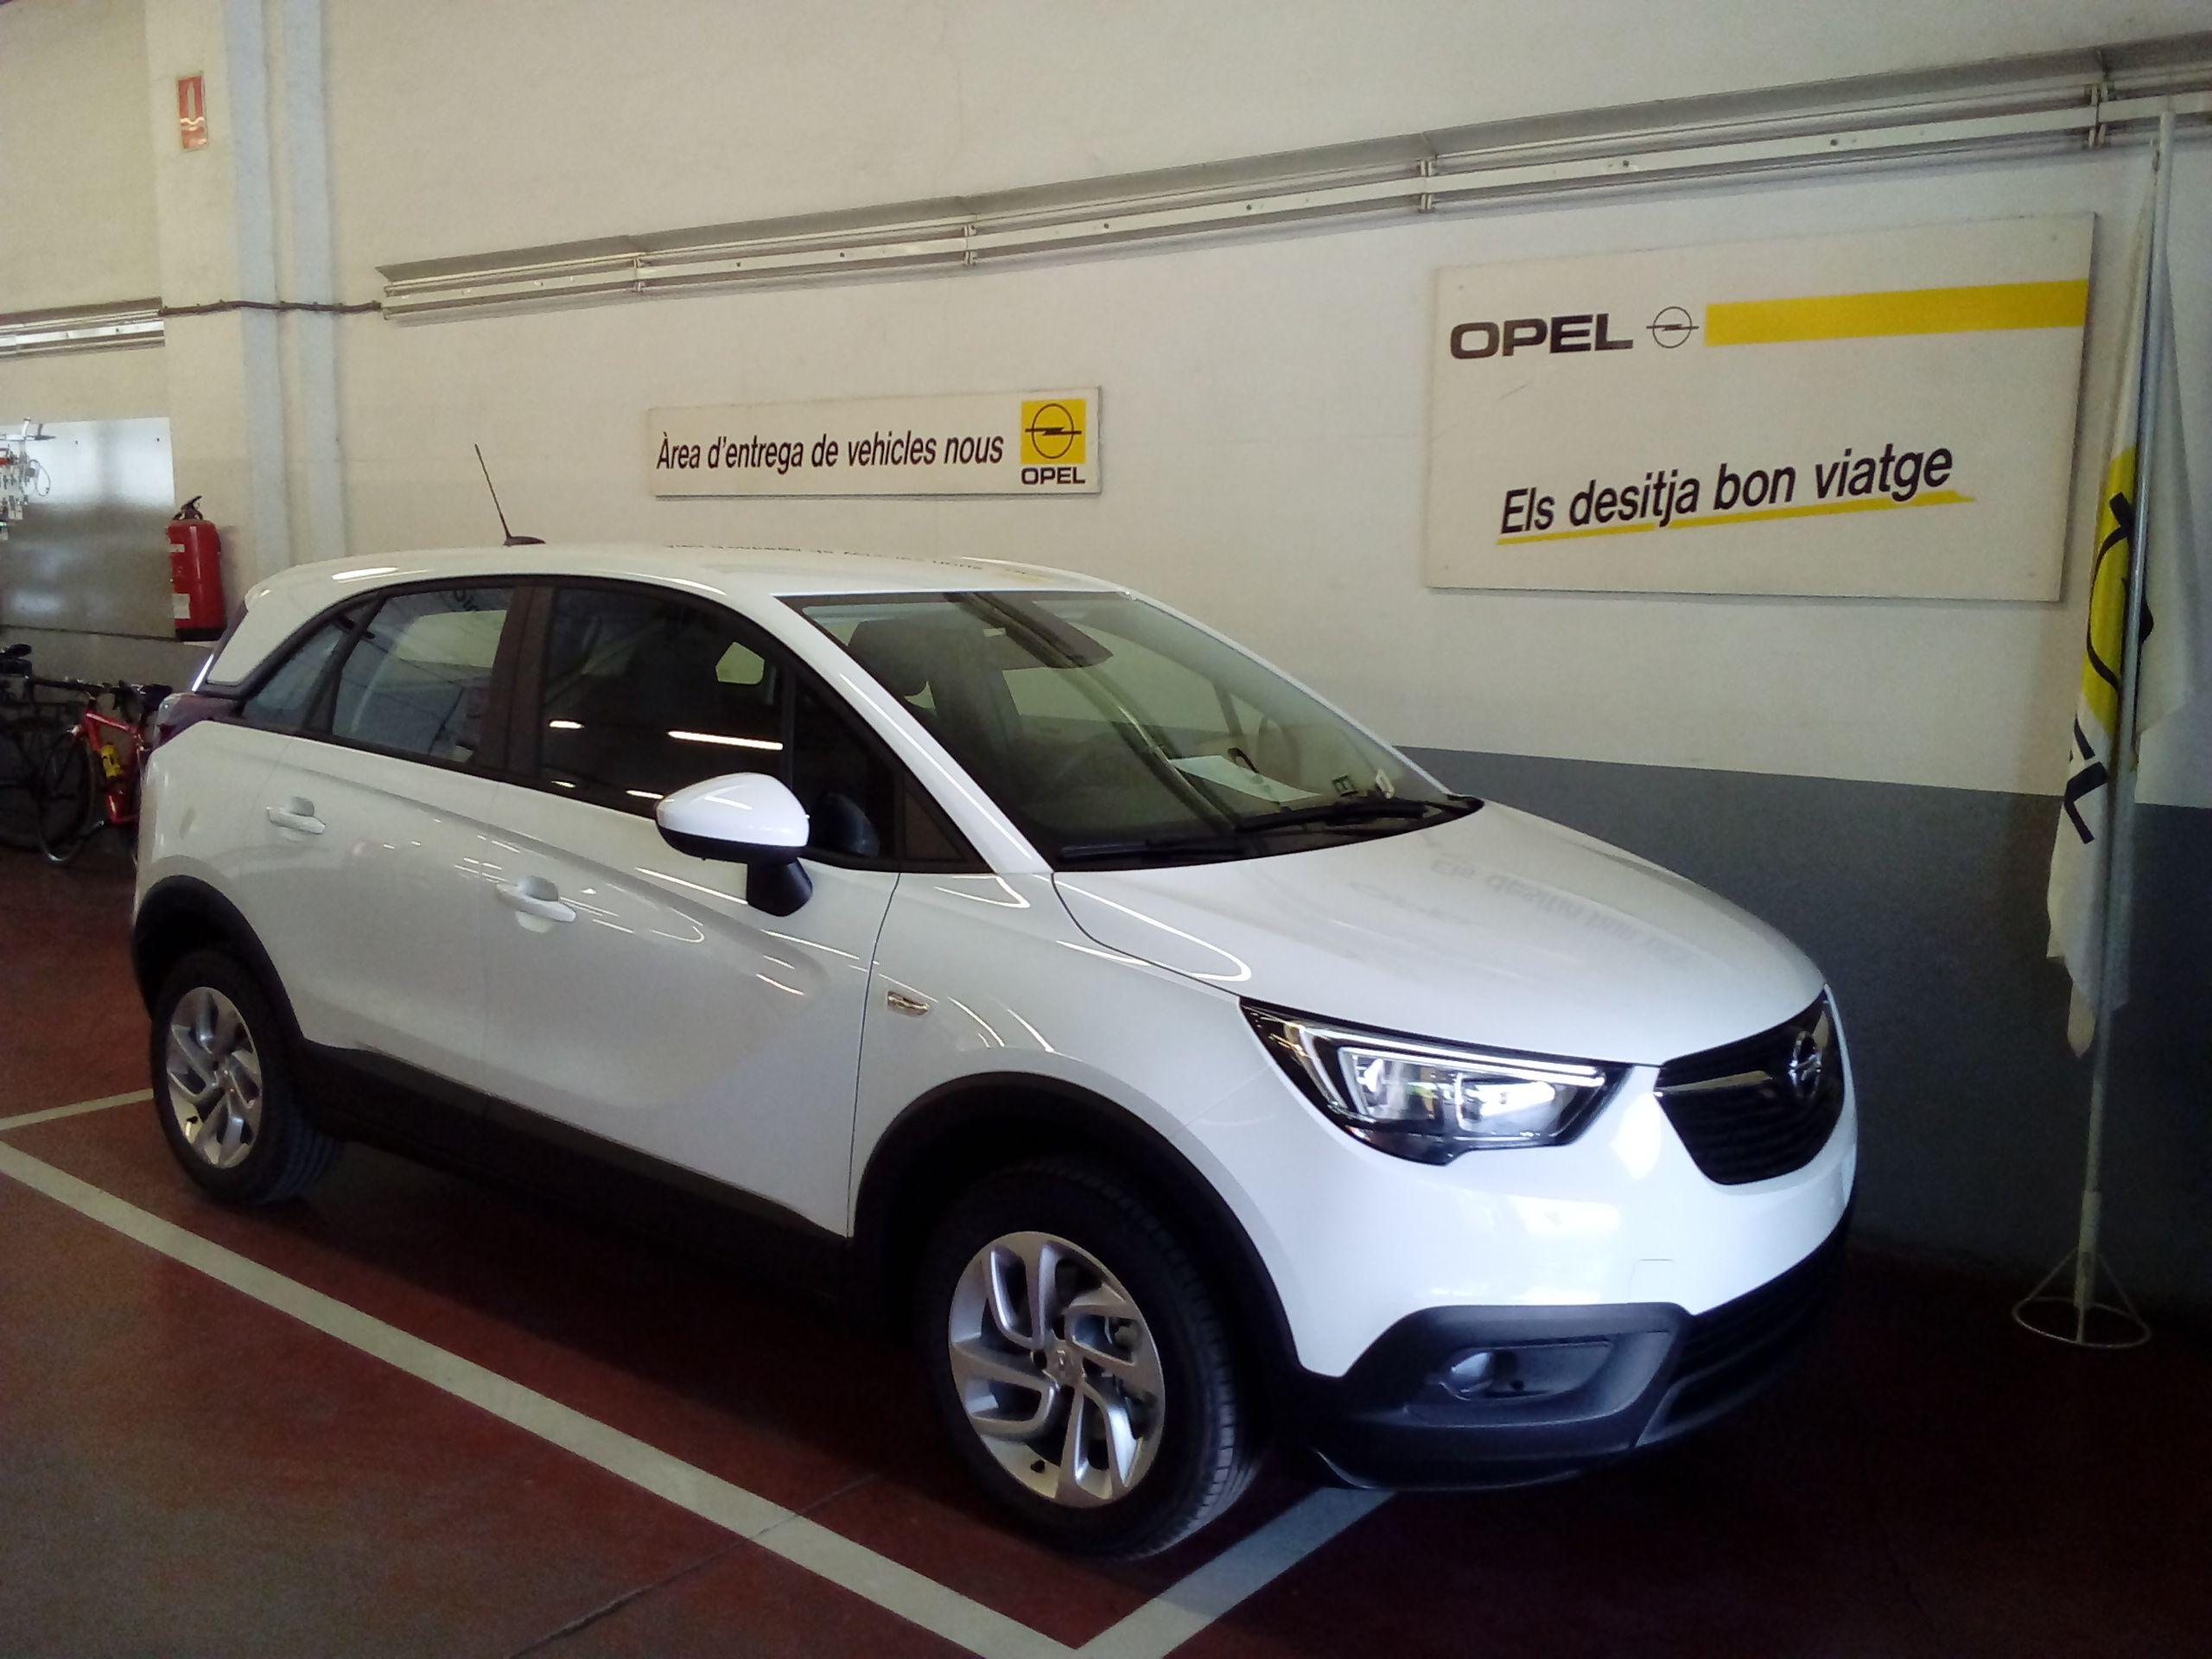 NOU  Opel Crossland X, disseny urbà vine i descobreix-lo